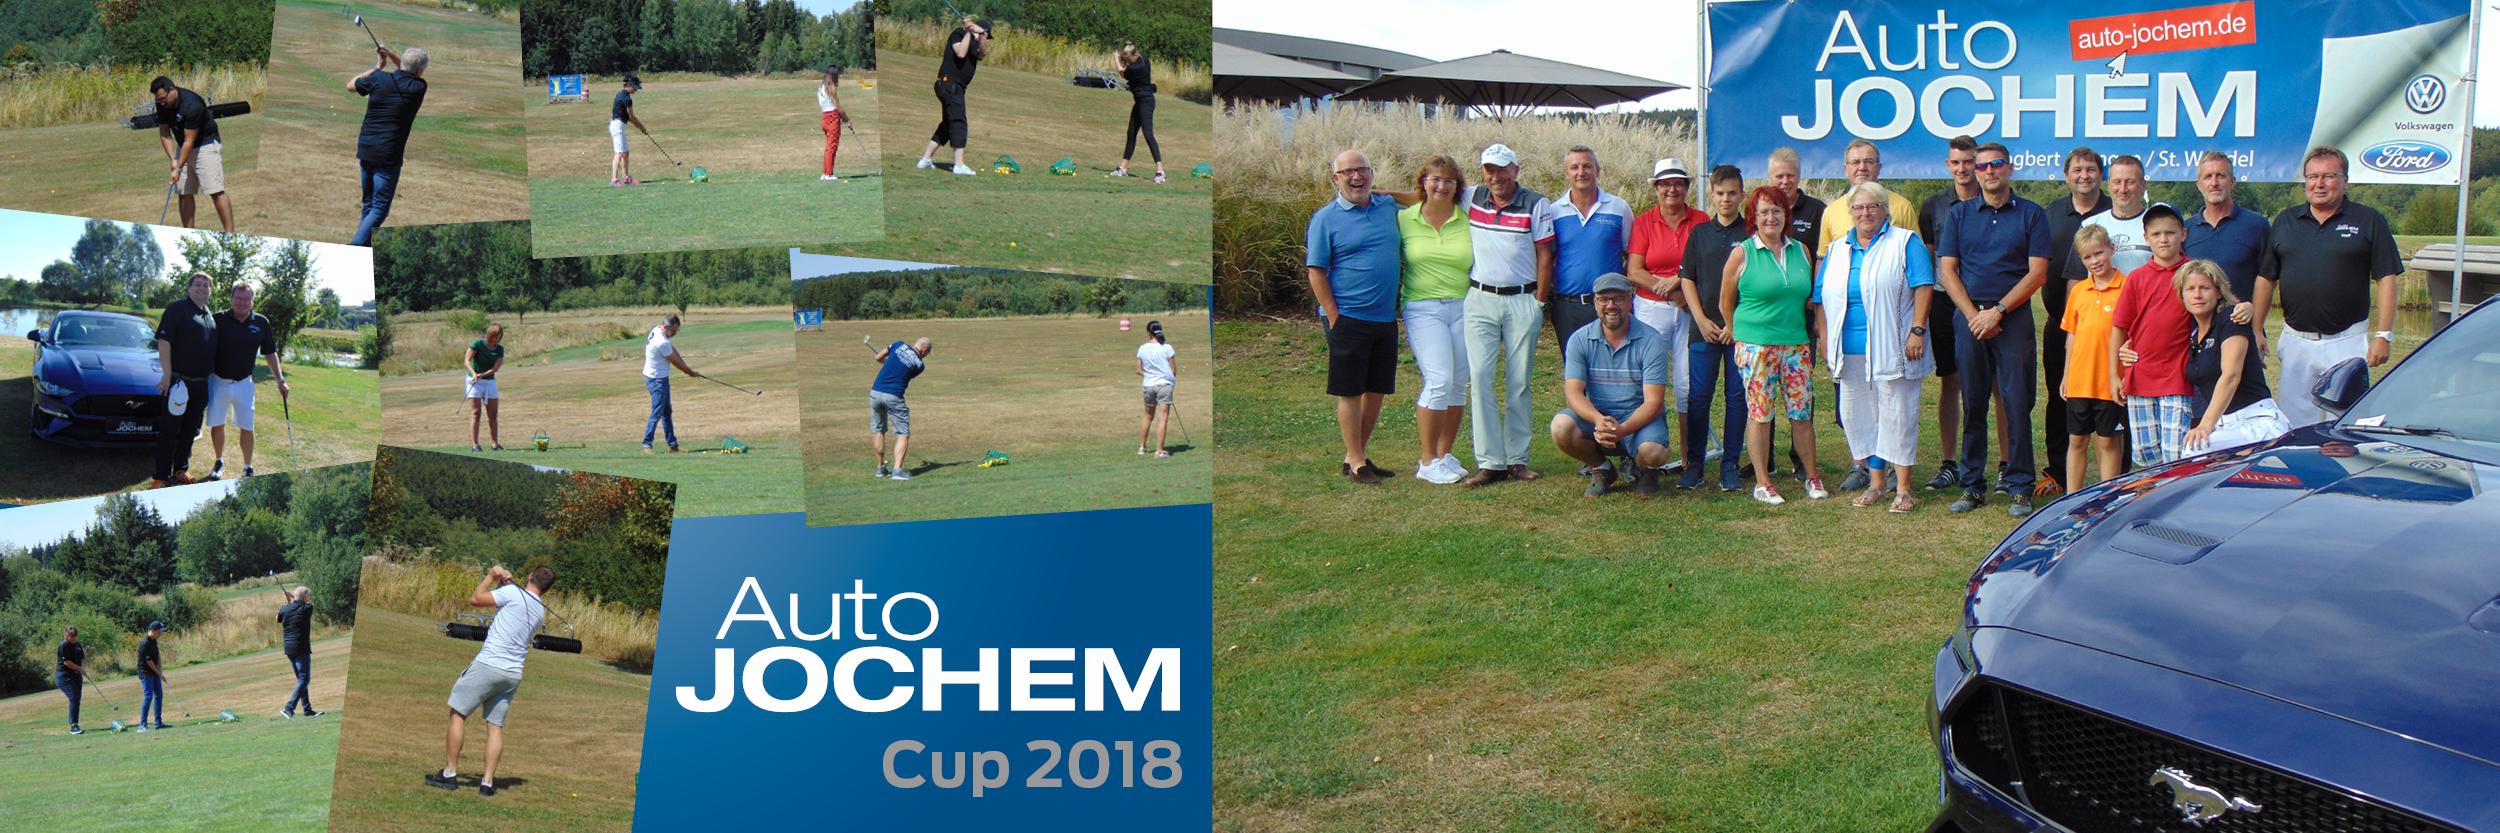 Auto Jochem Cup 2018